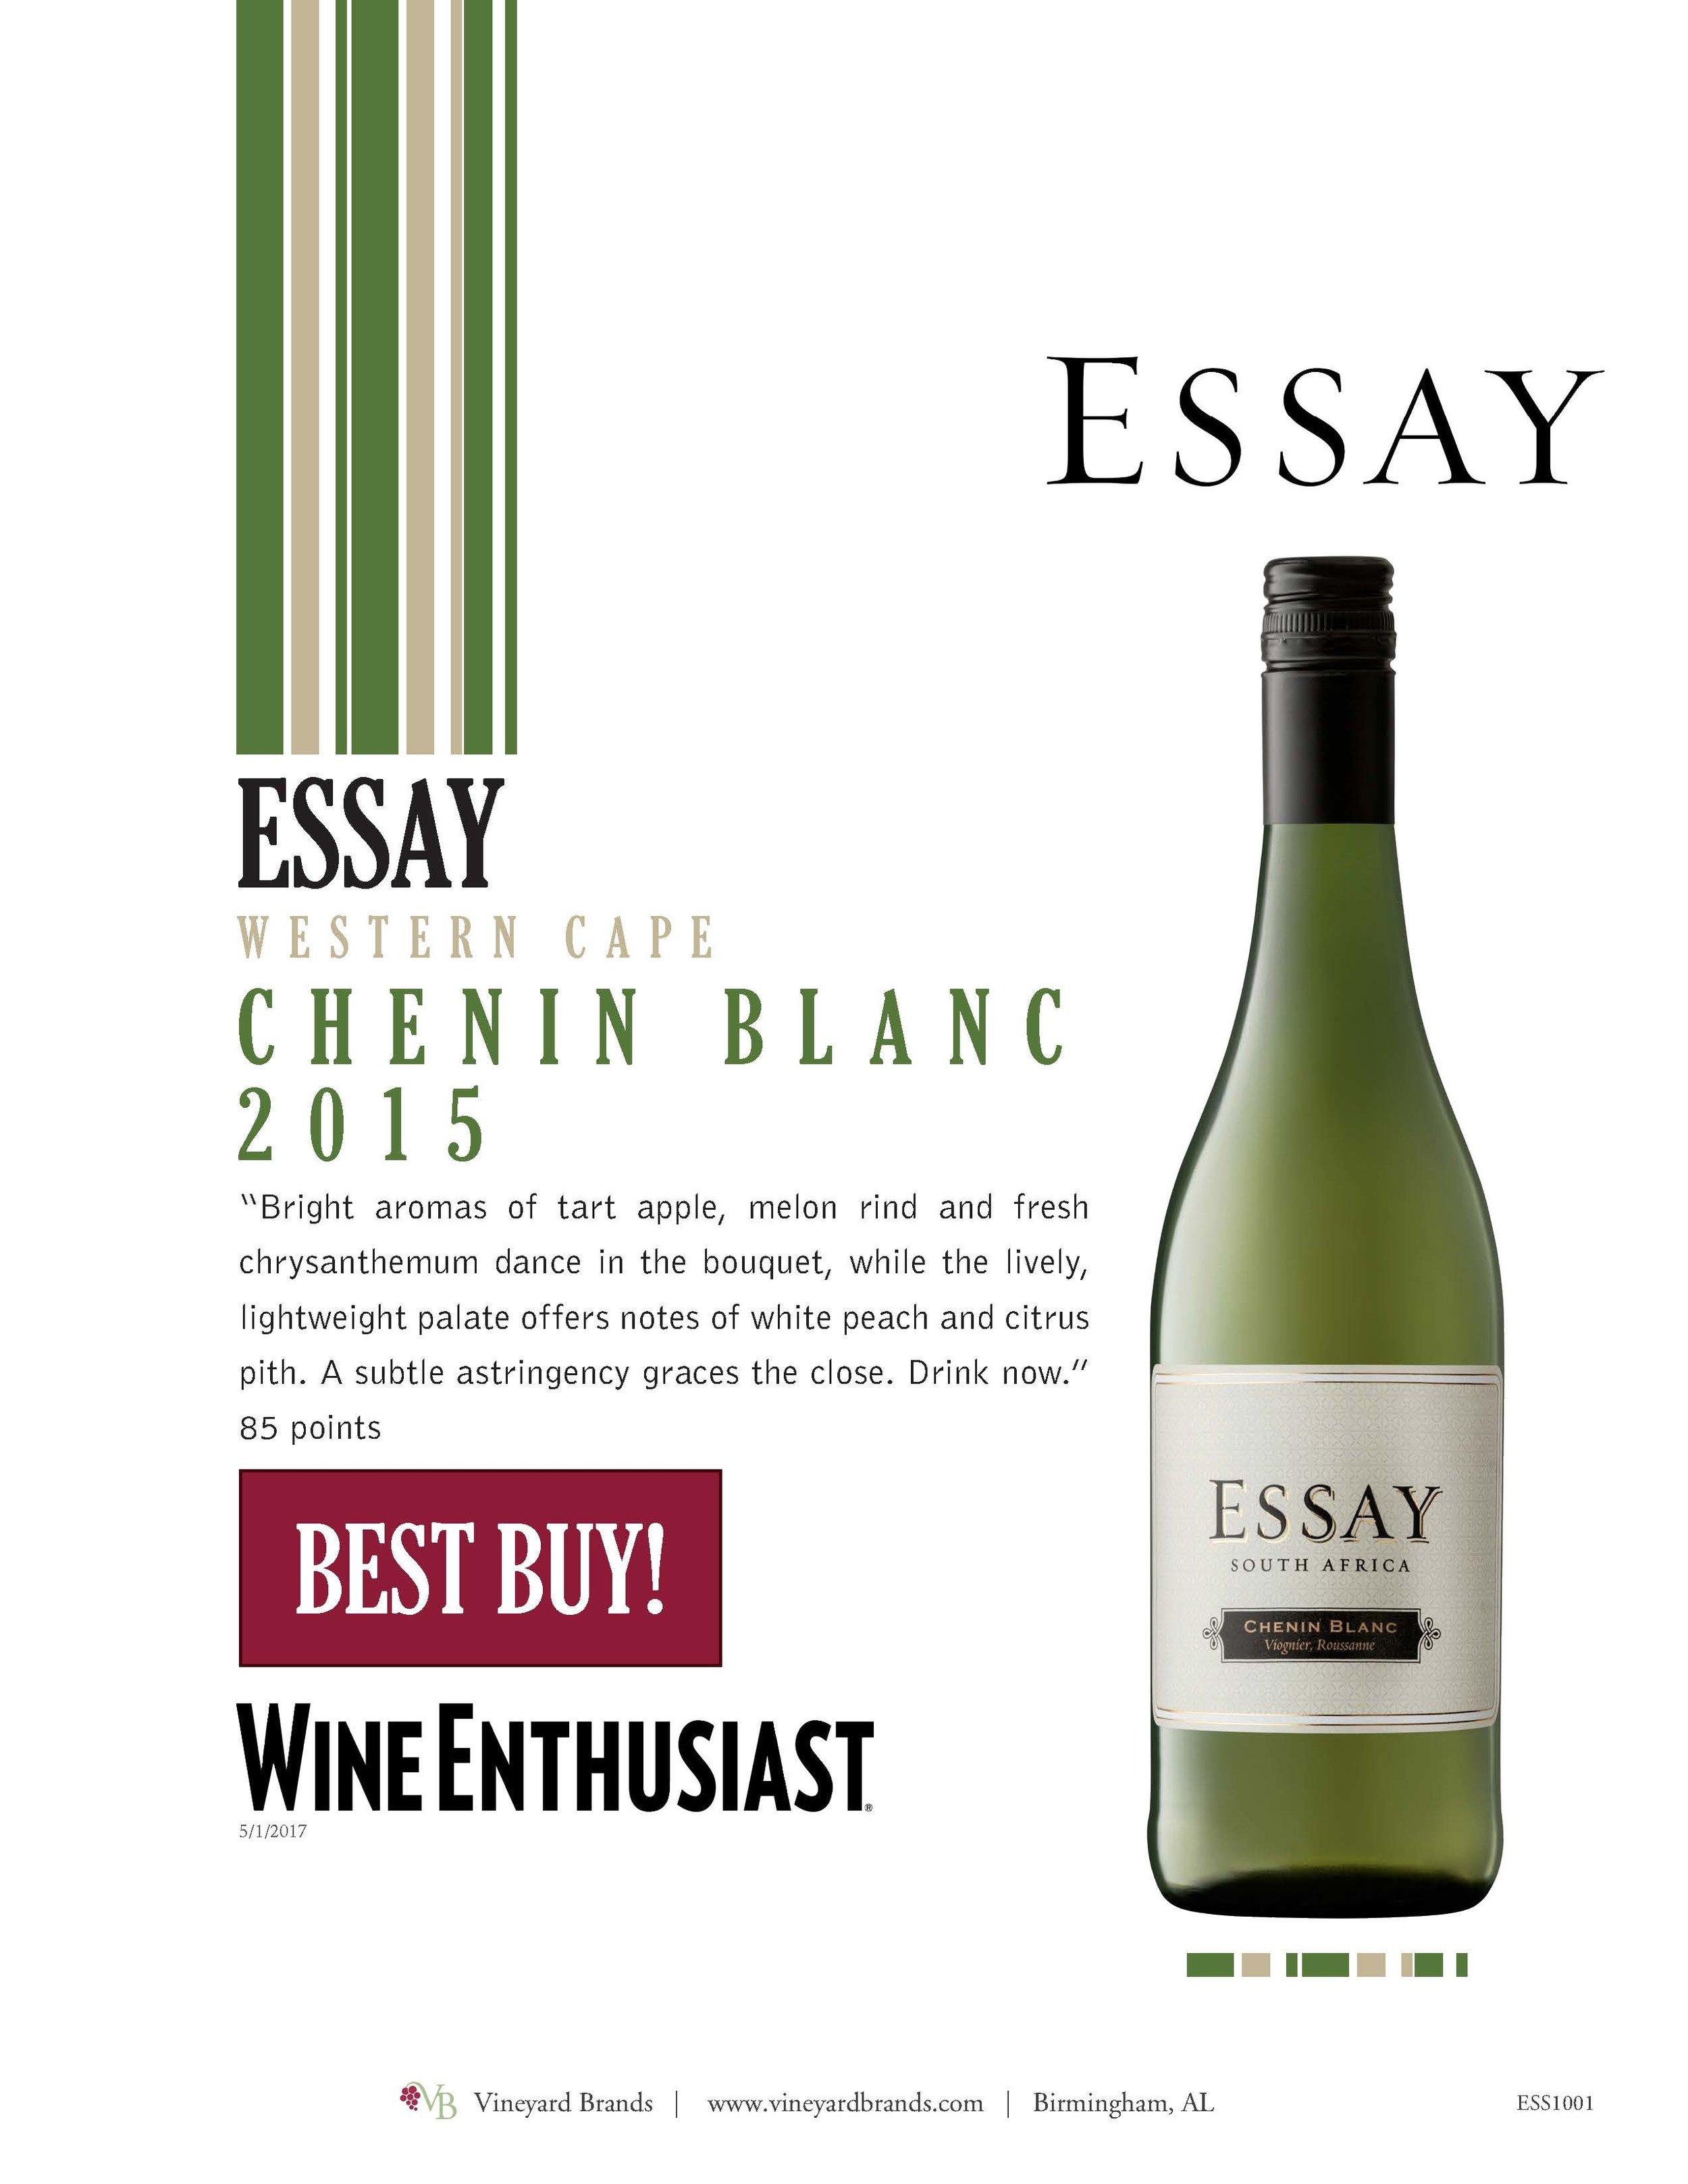 Essay Chenin Blanc 2015.jpg